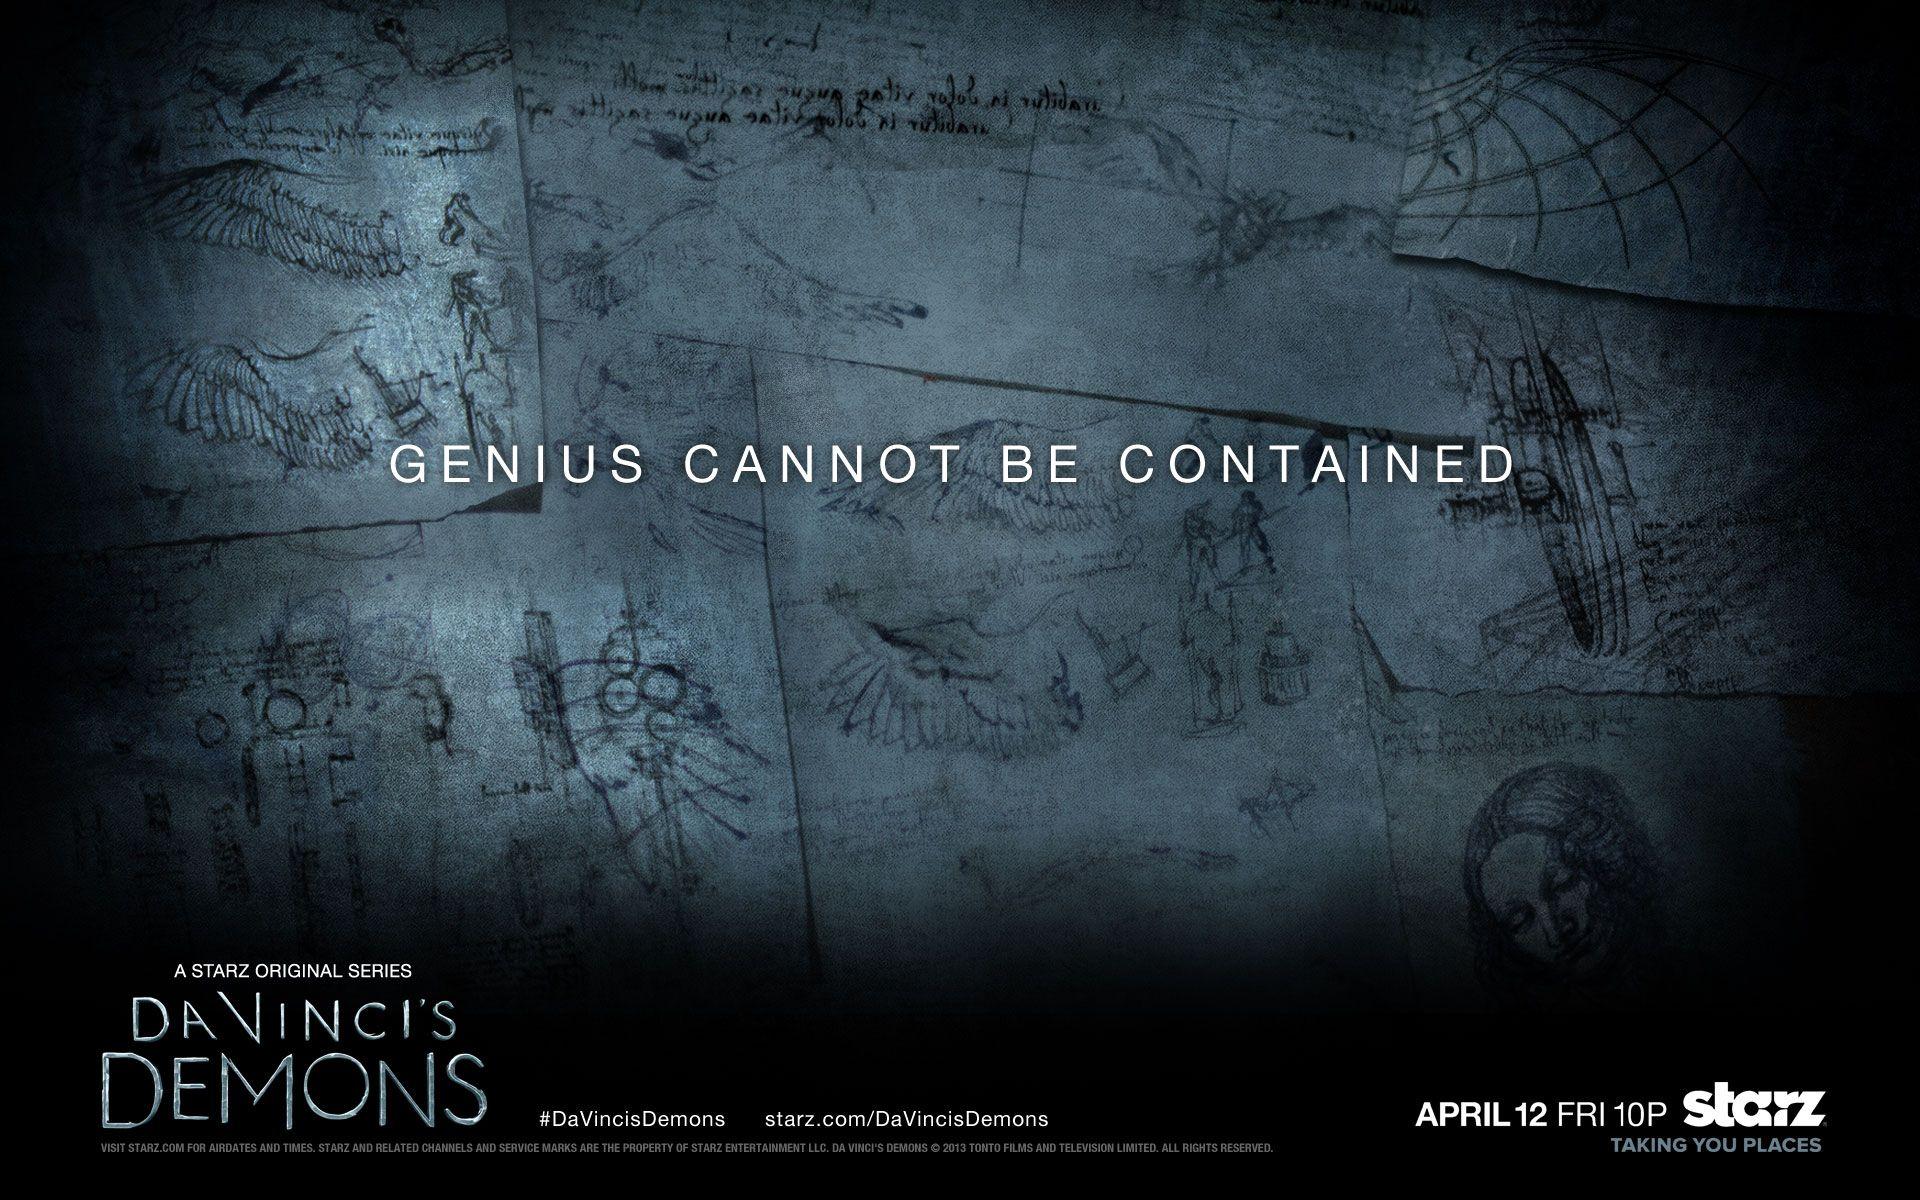 Wallpaper Of Da Vinci's Demons For Fans Of Da Vinci's